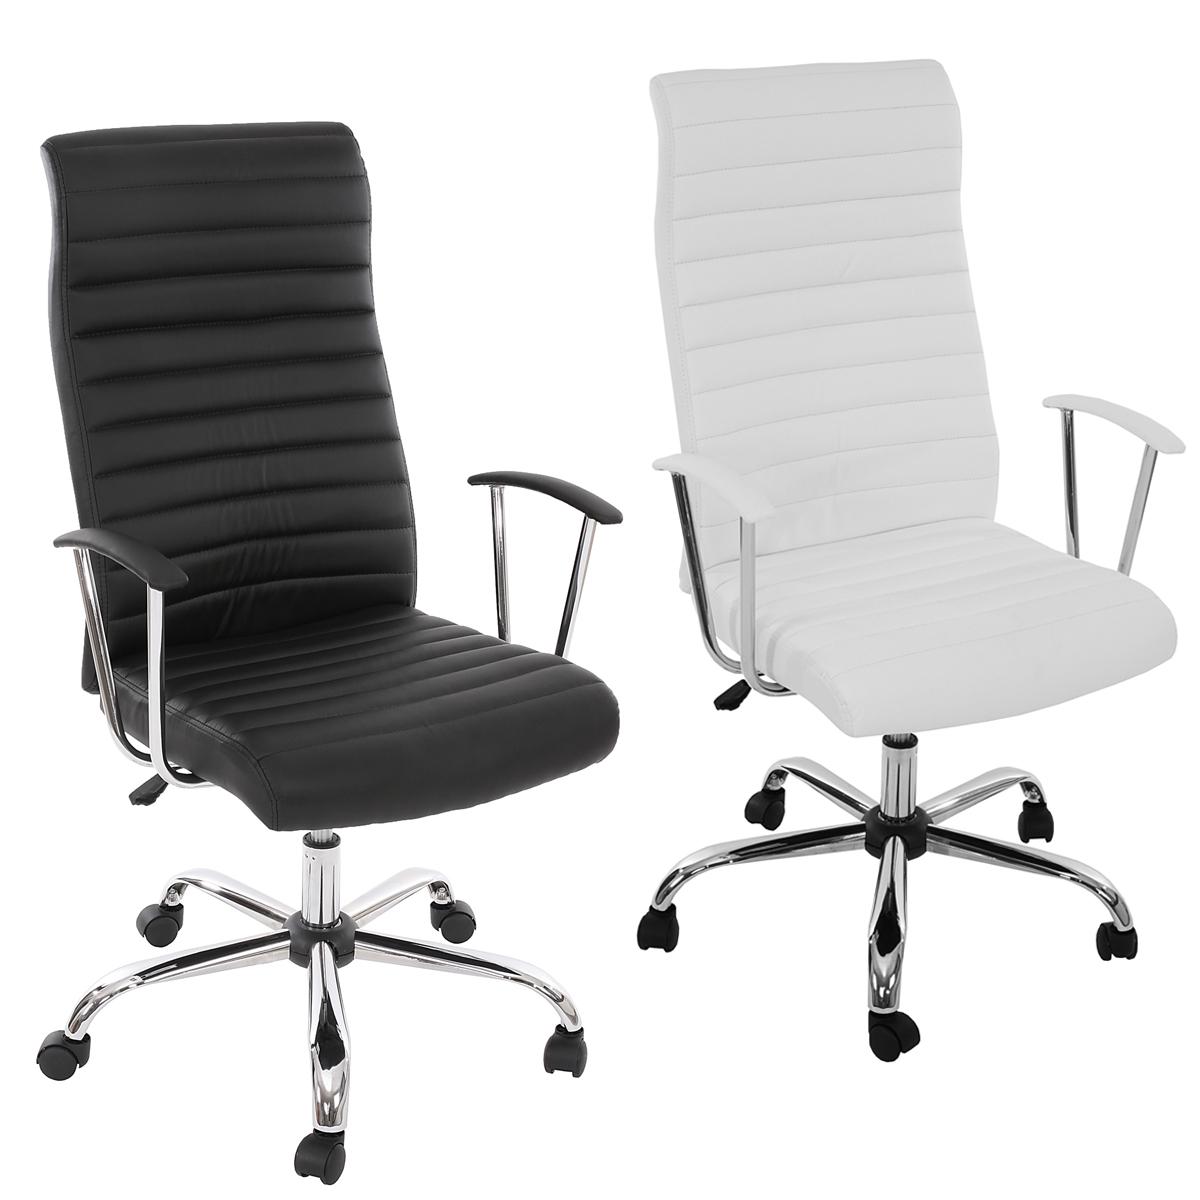 Ergonomischer bürostuhl weiß  Bürostuhl Drehstuhl Chefsessel Cagliari, ergonomische Form ...